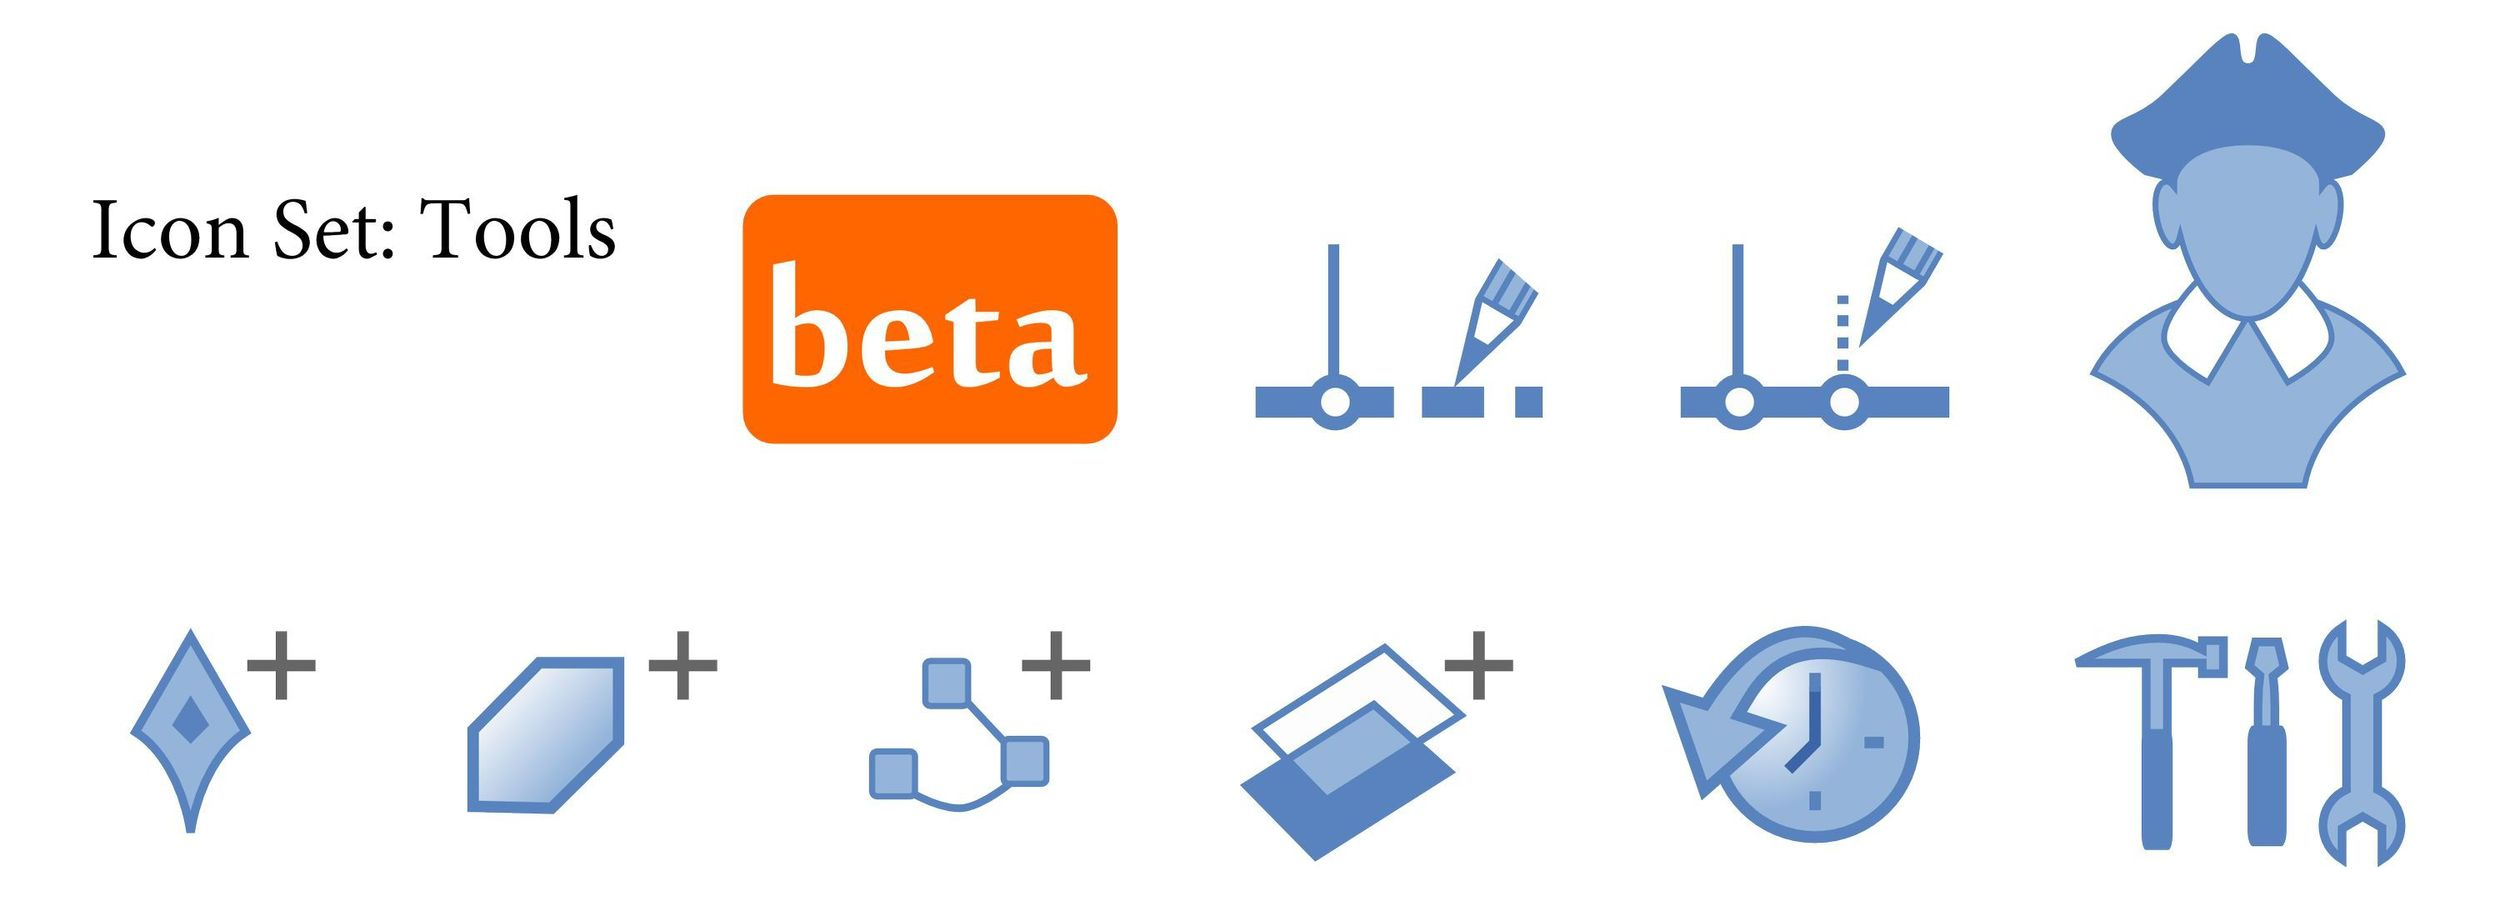 Icon Set: Tools